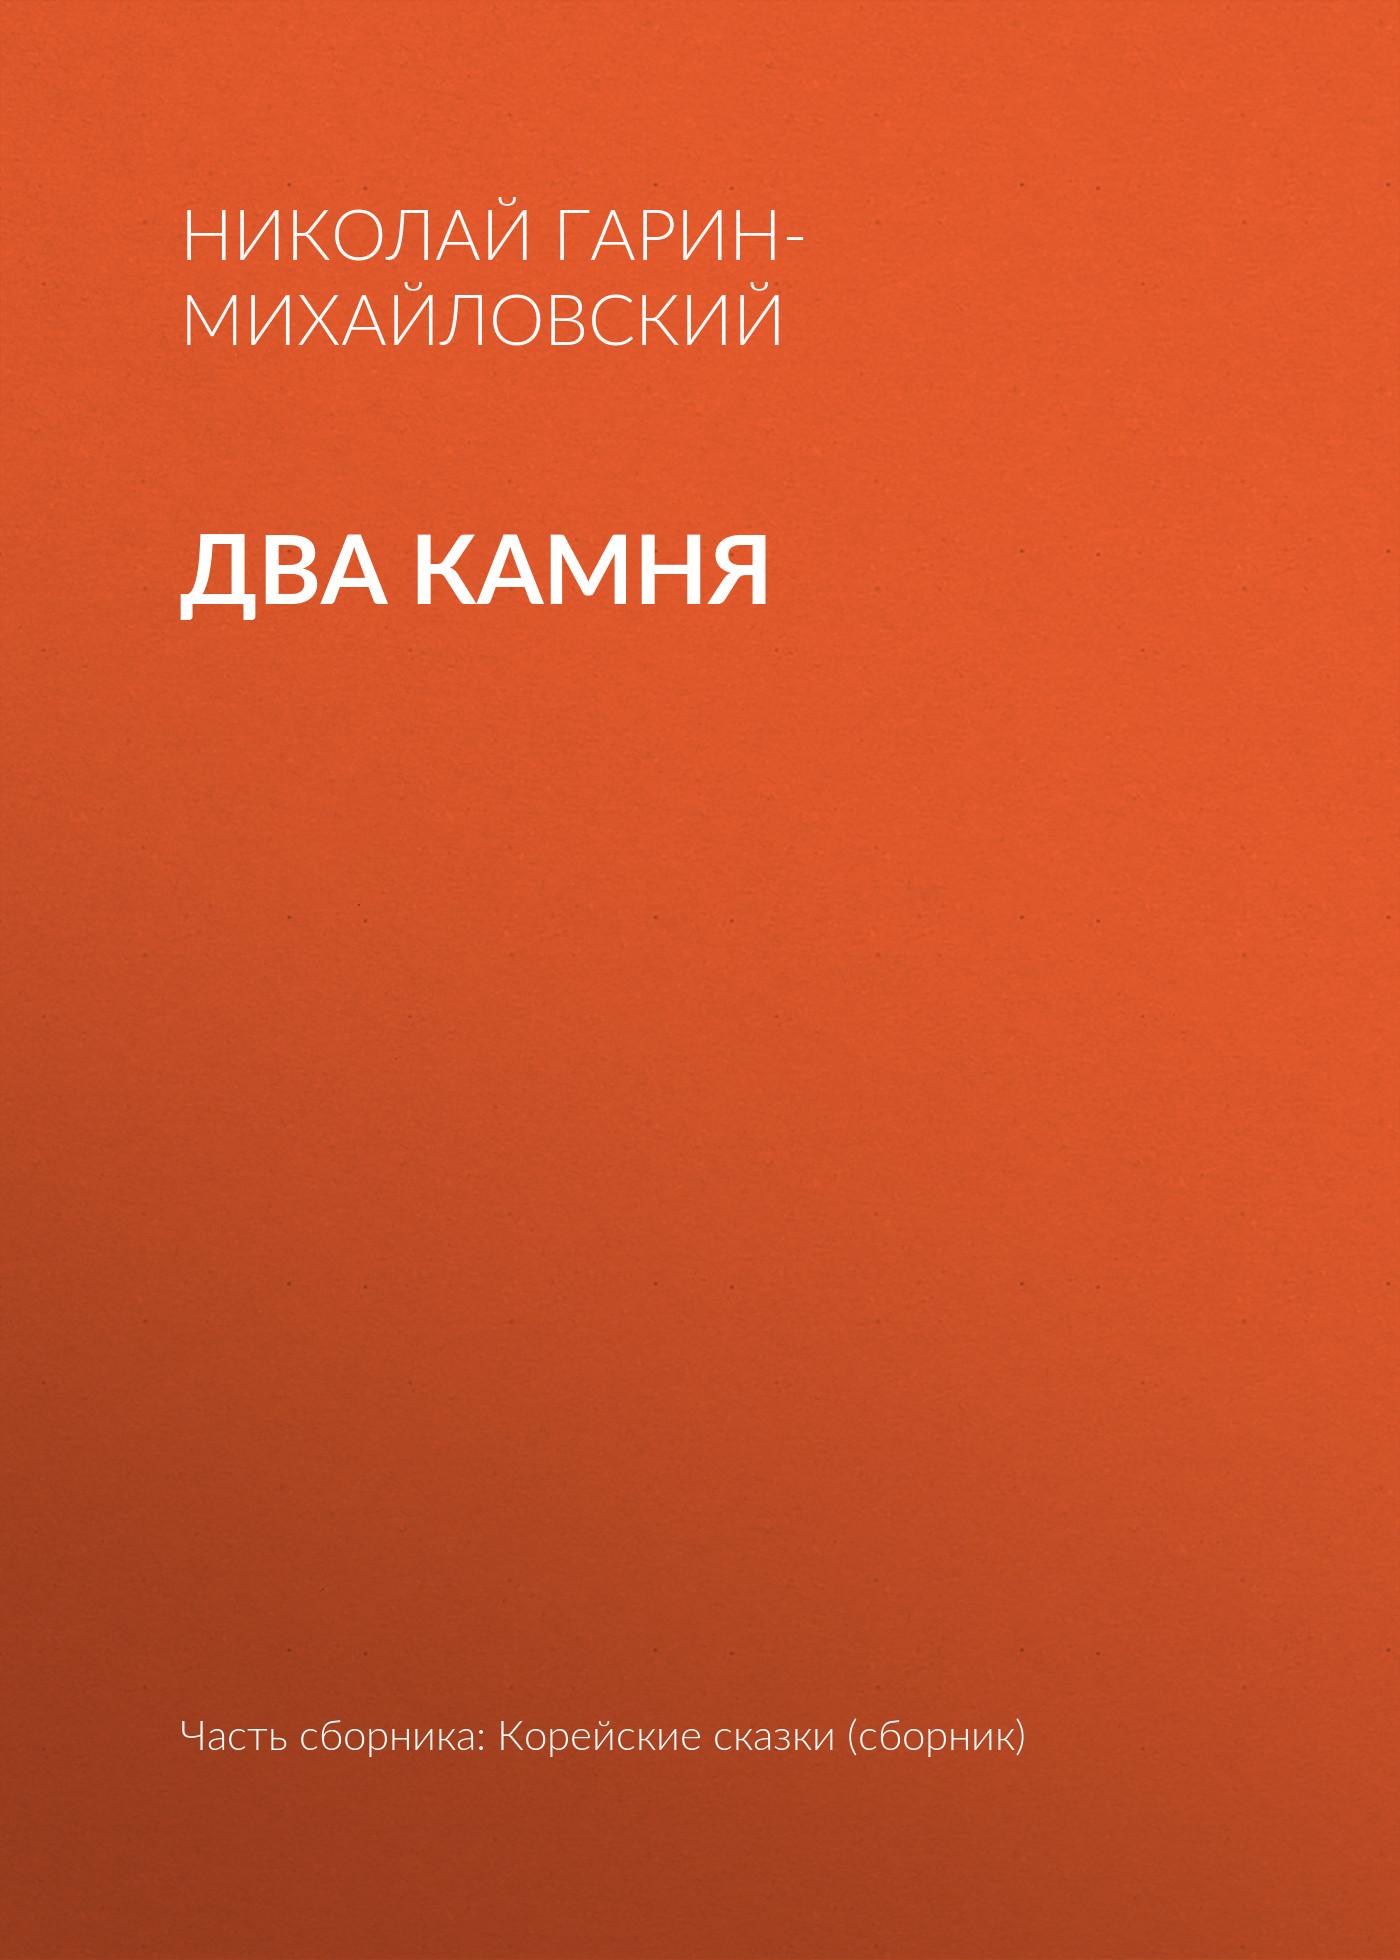 Николай Гарин-Михайловский Два камня цена